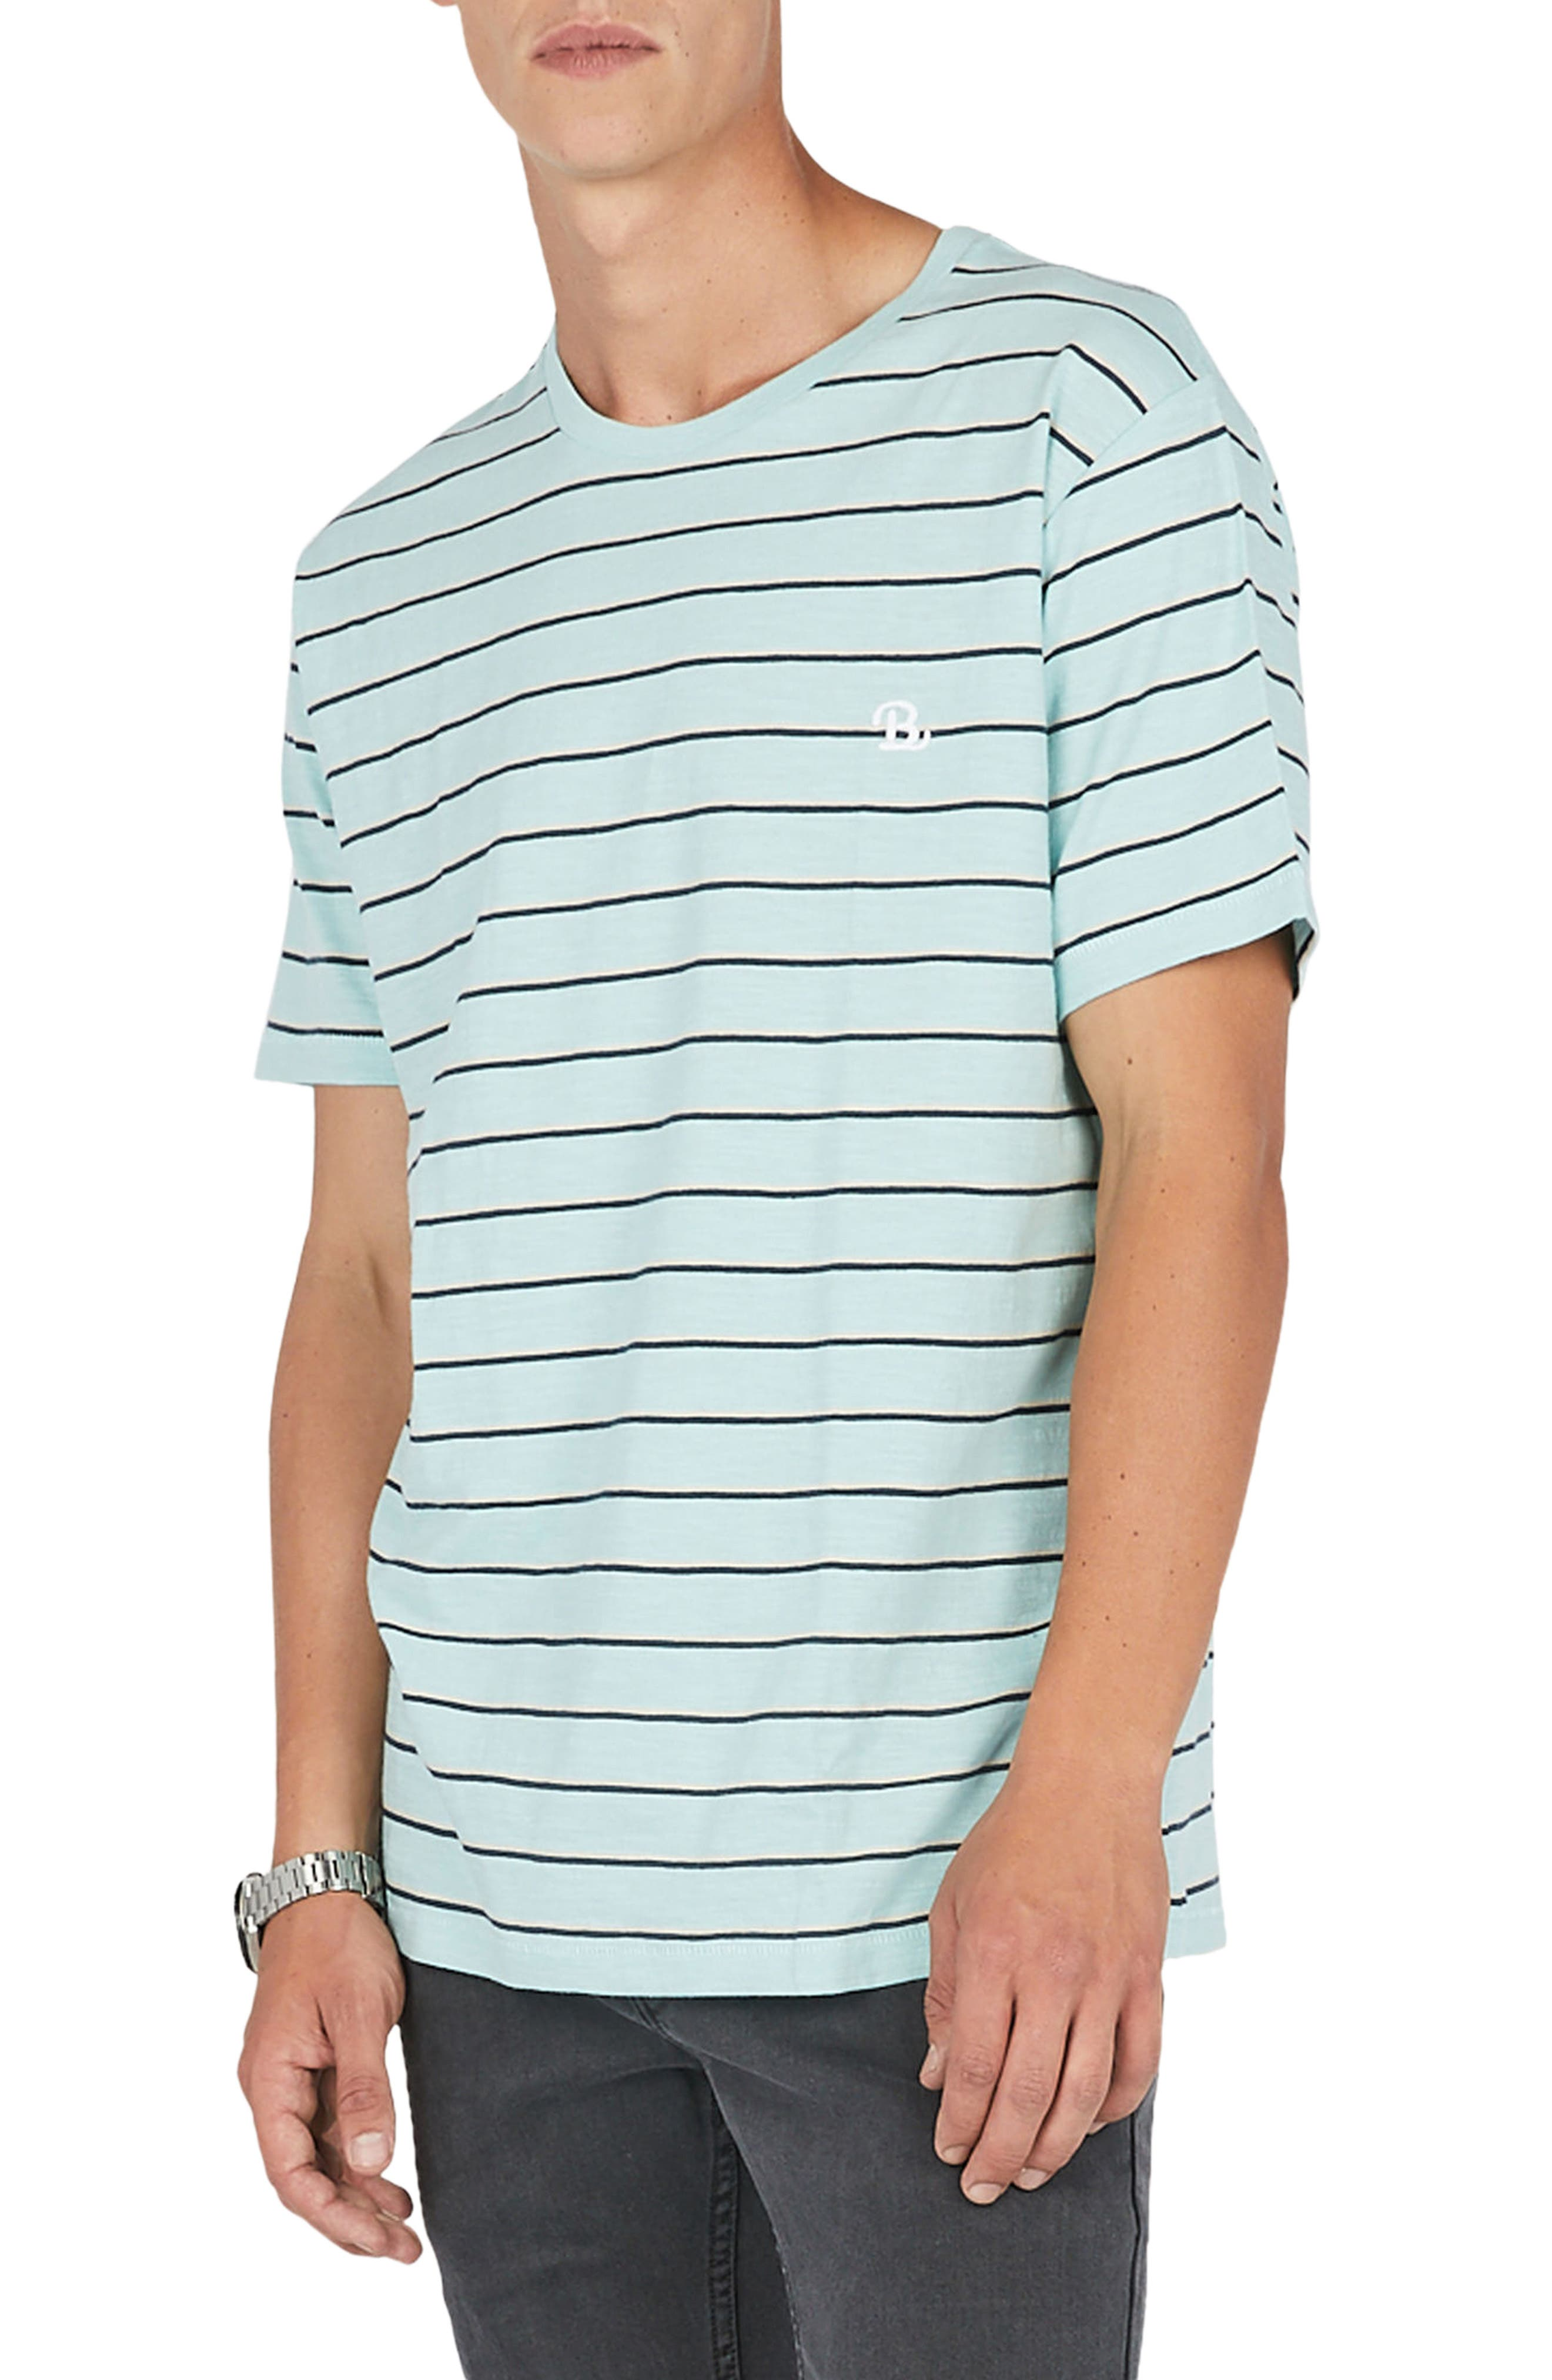 B.Schooled T-Shirt,                             Main thumbnail 1, color,                             400